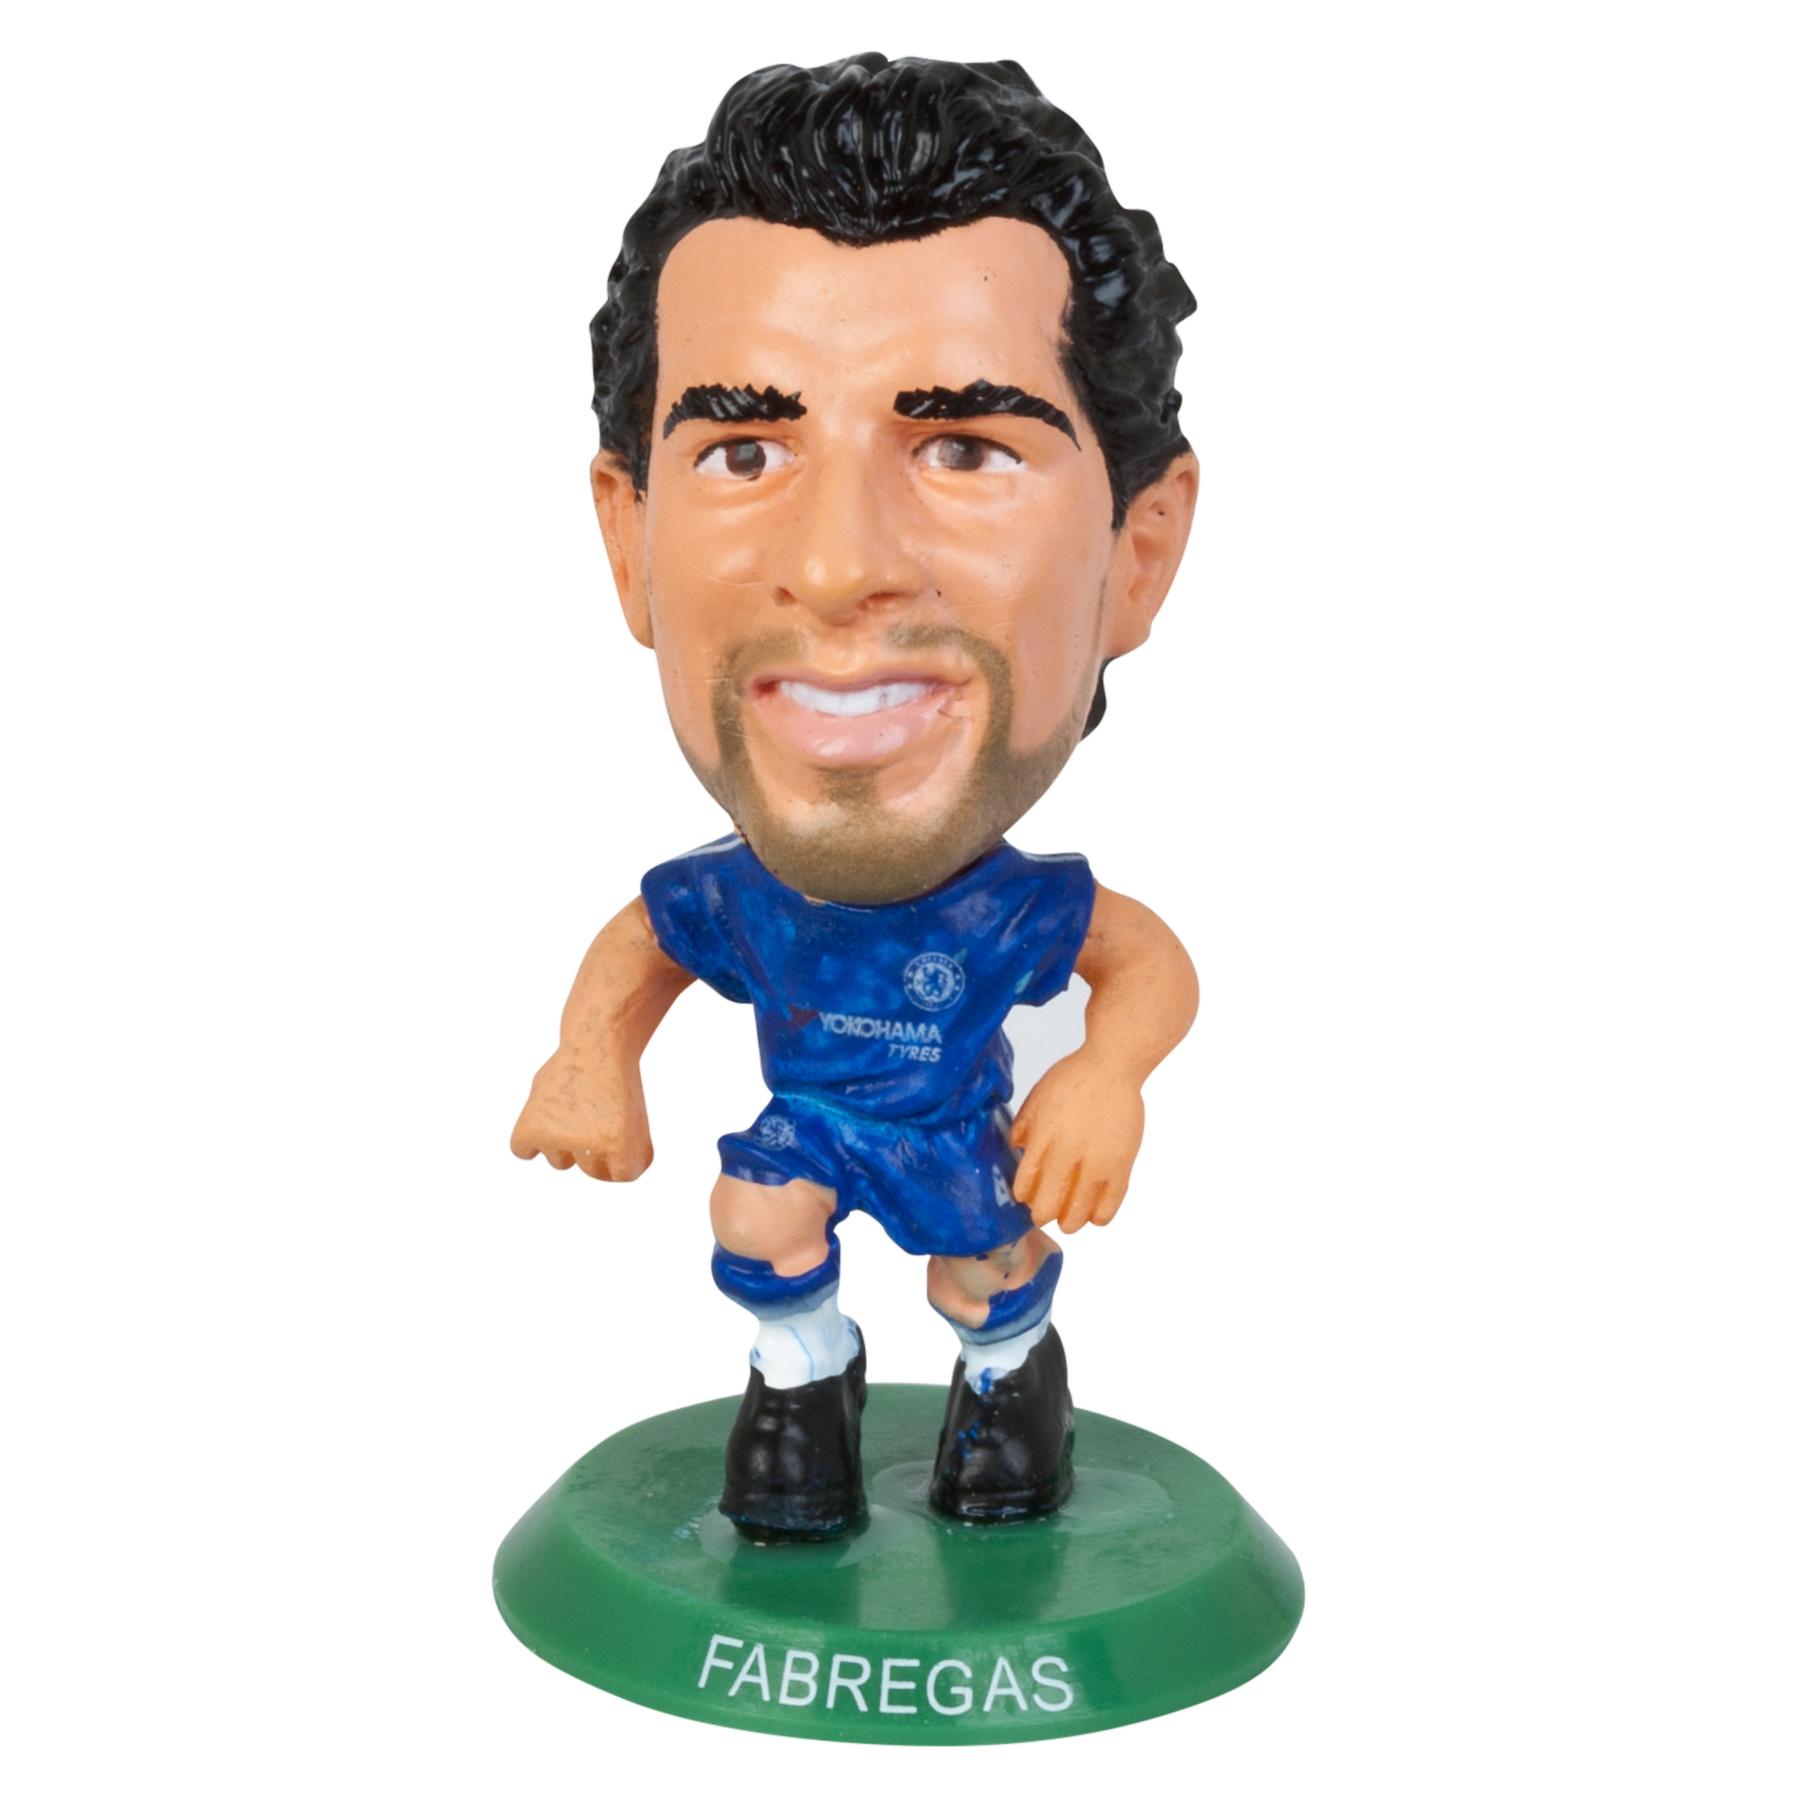 Chelsea Fabregas Home SoccerStarz